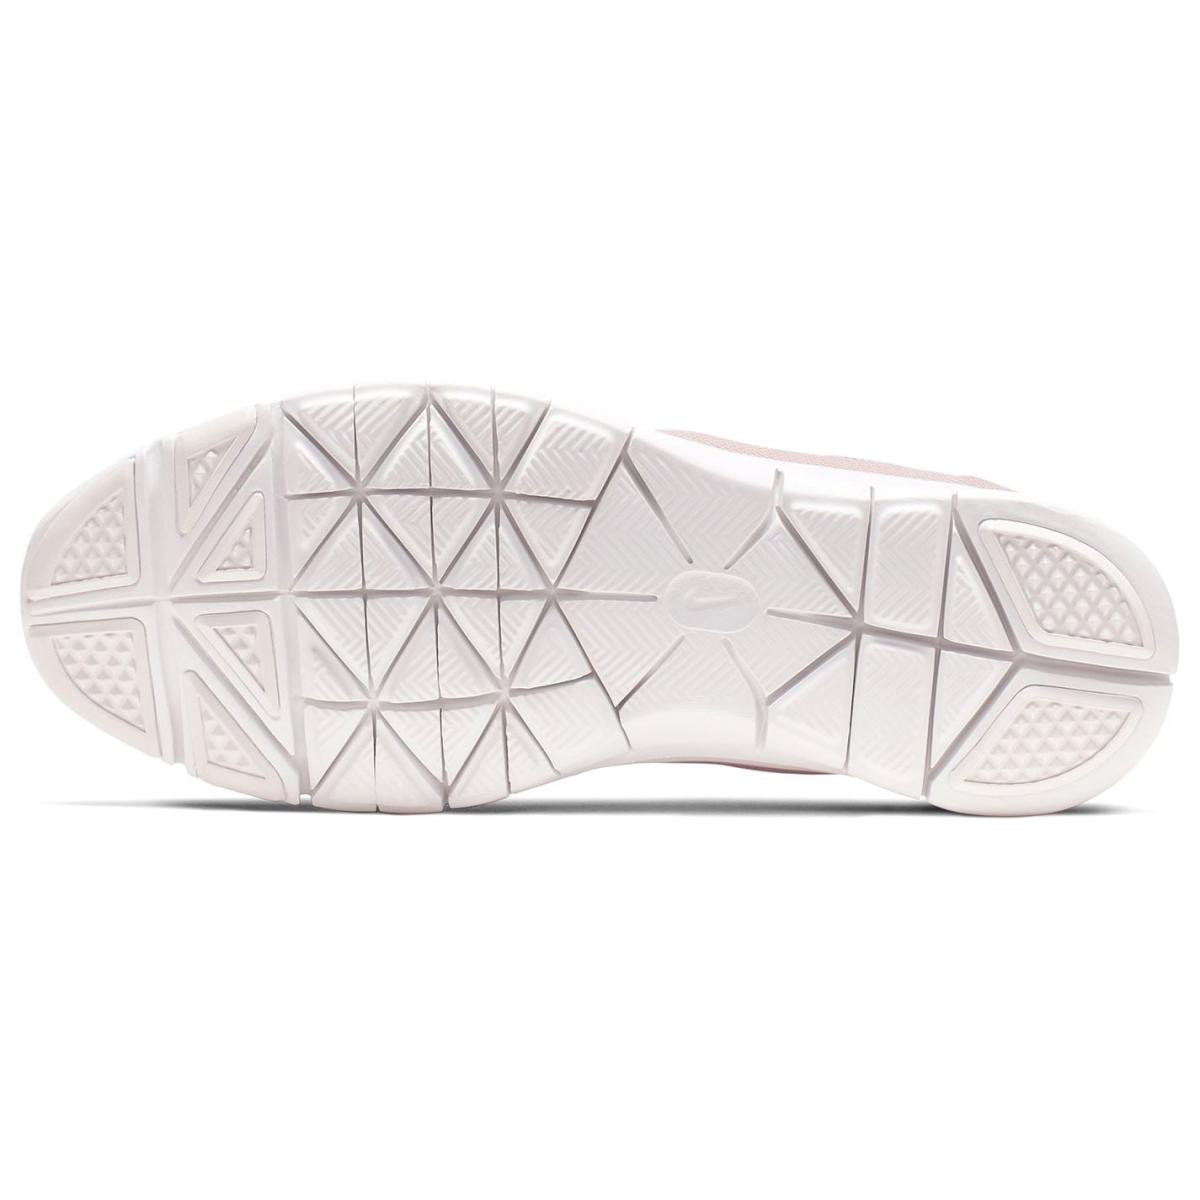 Nike-Flex-Laufschuhe-Turnschuhe-Damen-Sneaker-Sportschuhe-Jogging-3088 Indexbild 22